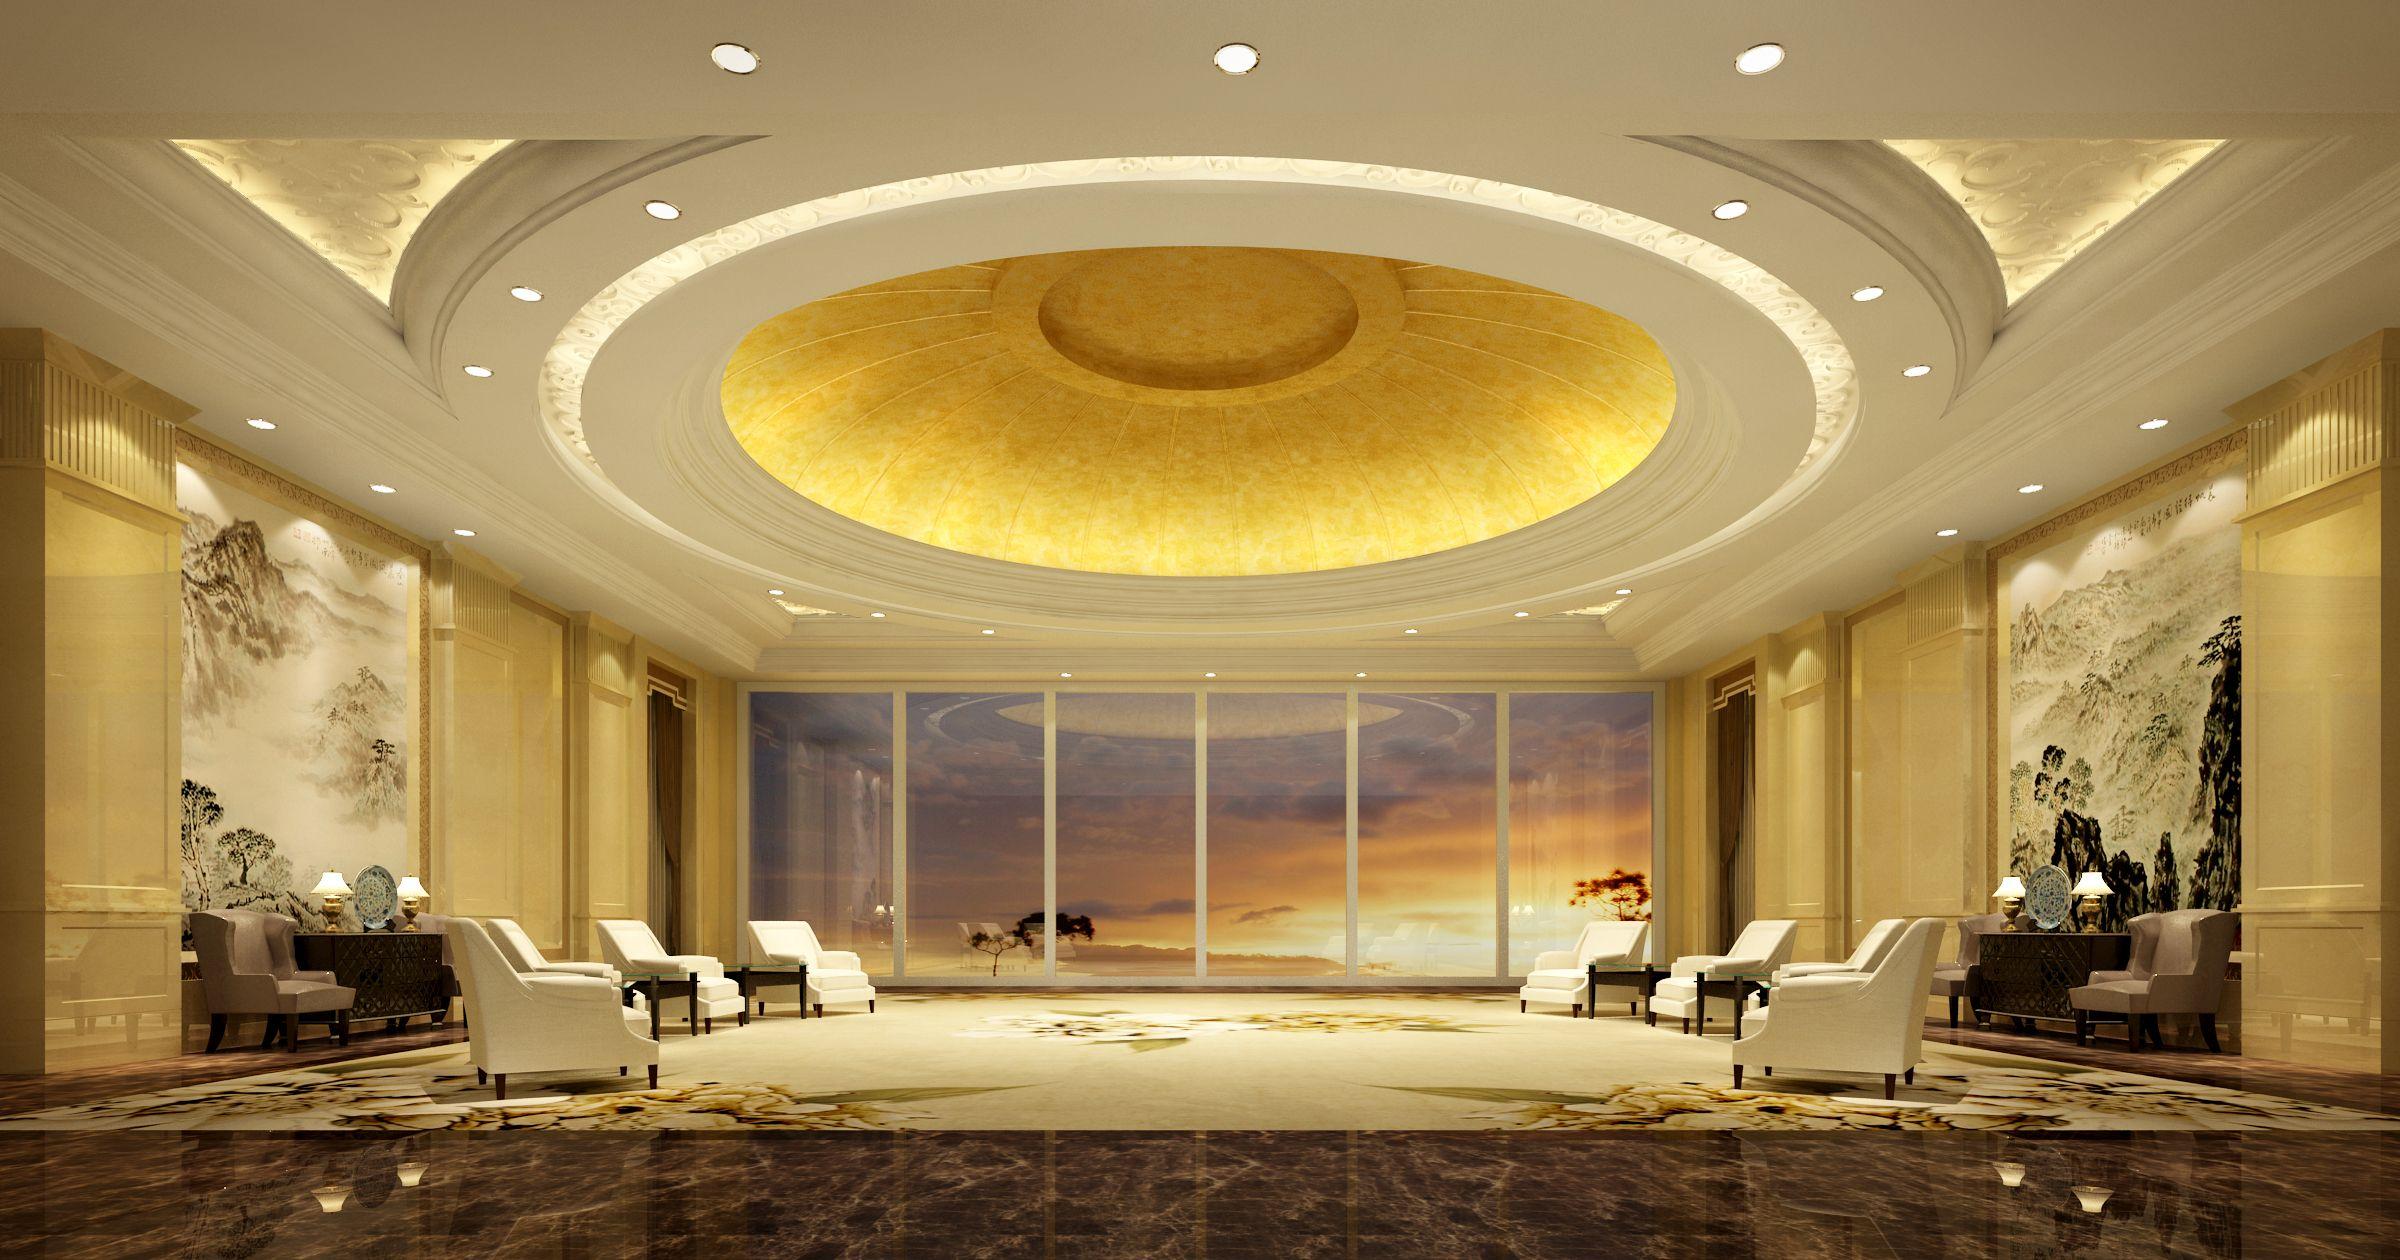 Interior Hotel hotel interior | home & hotel decor | pinterest | hotel decor and